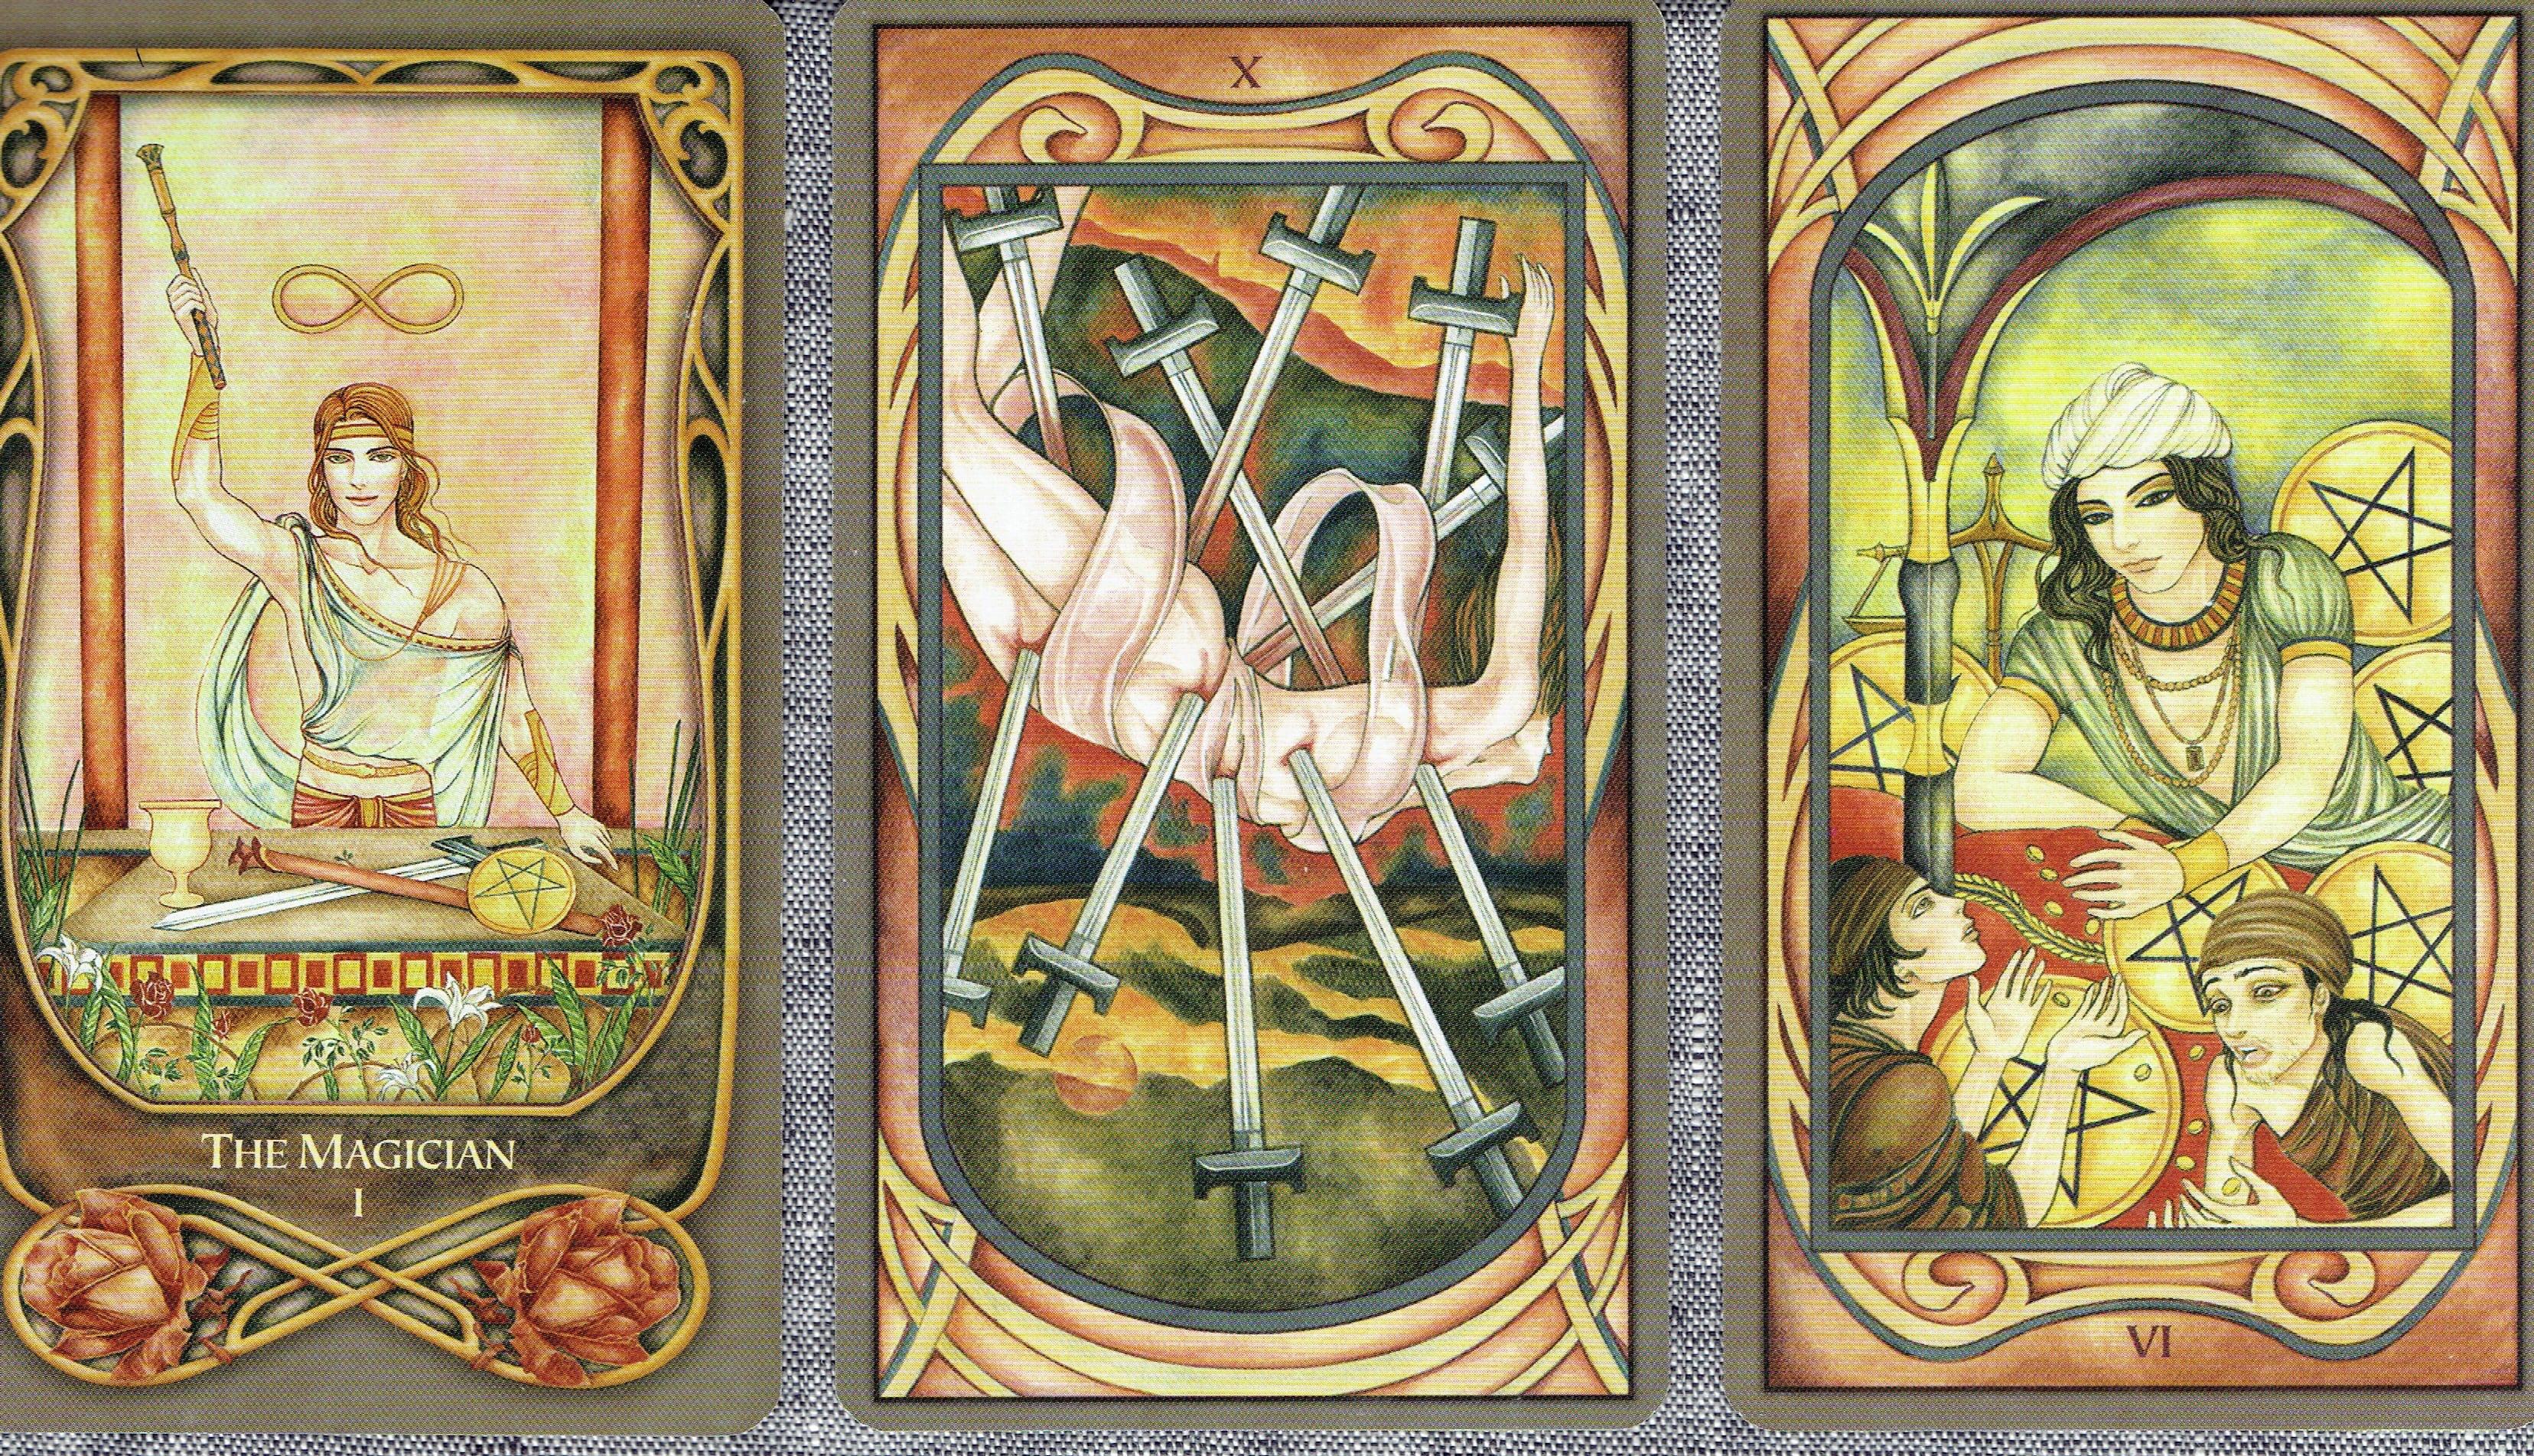 tarot cards in 3-card spread